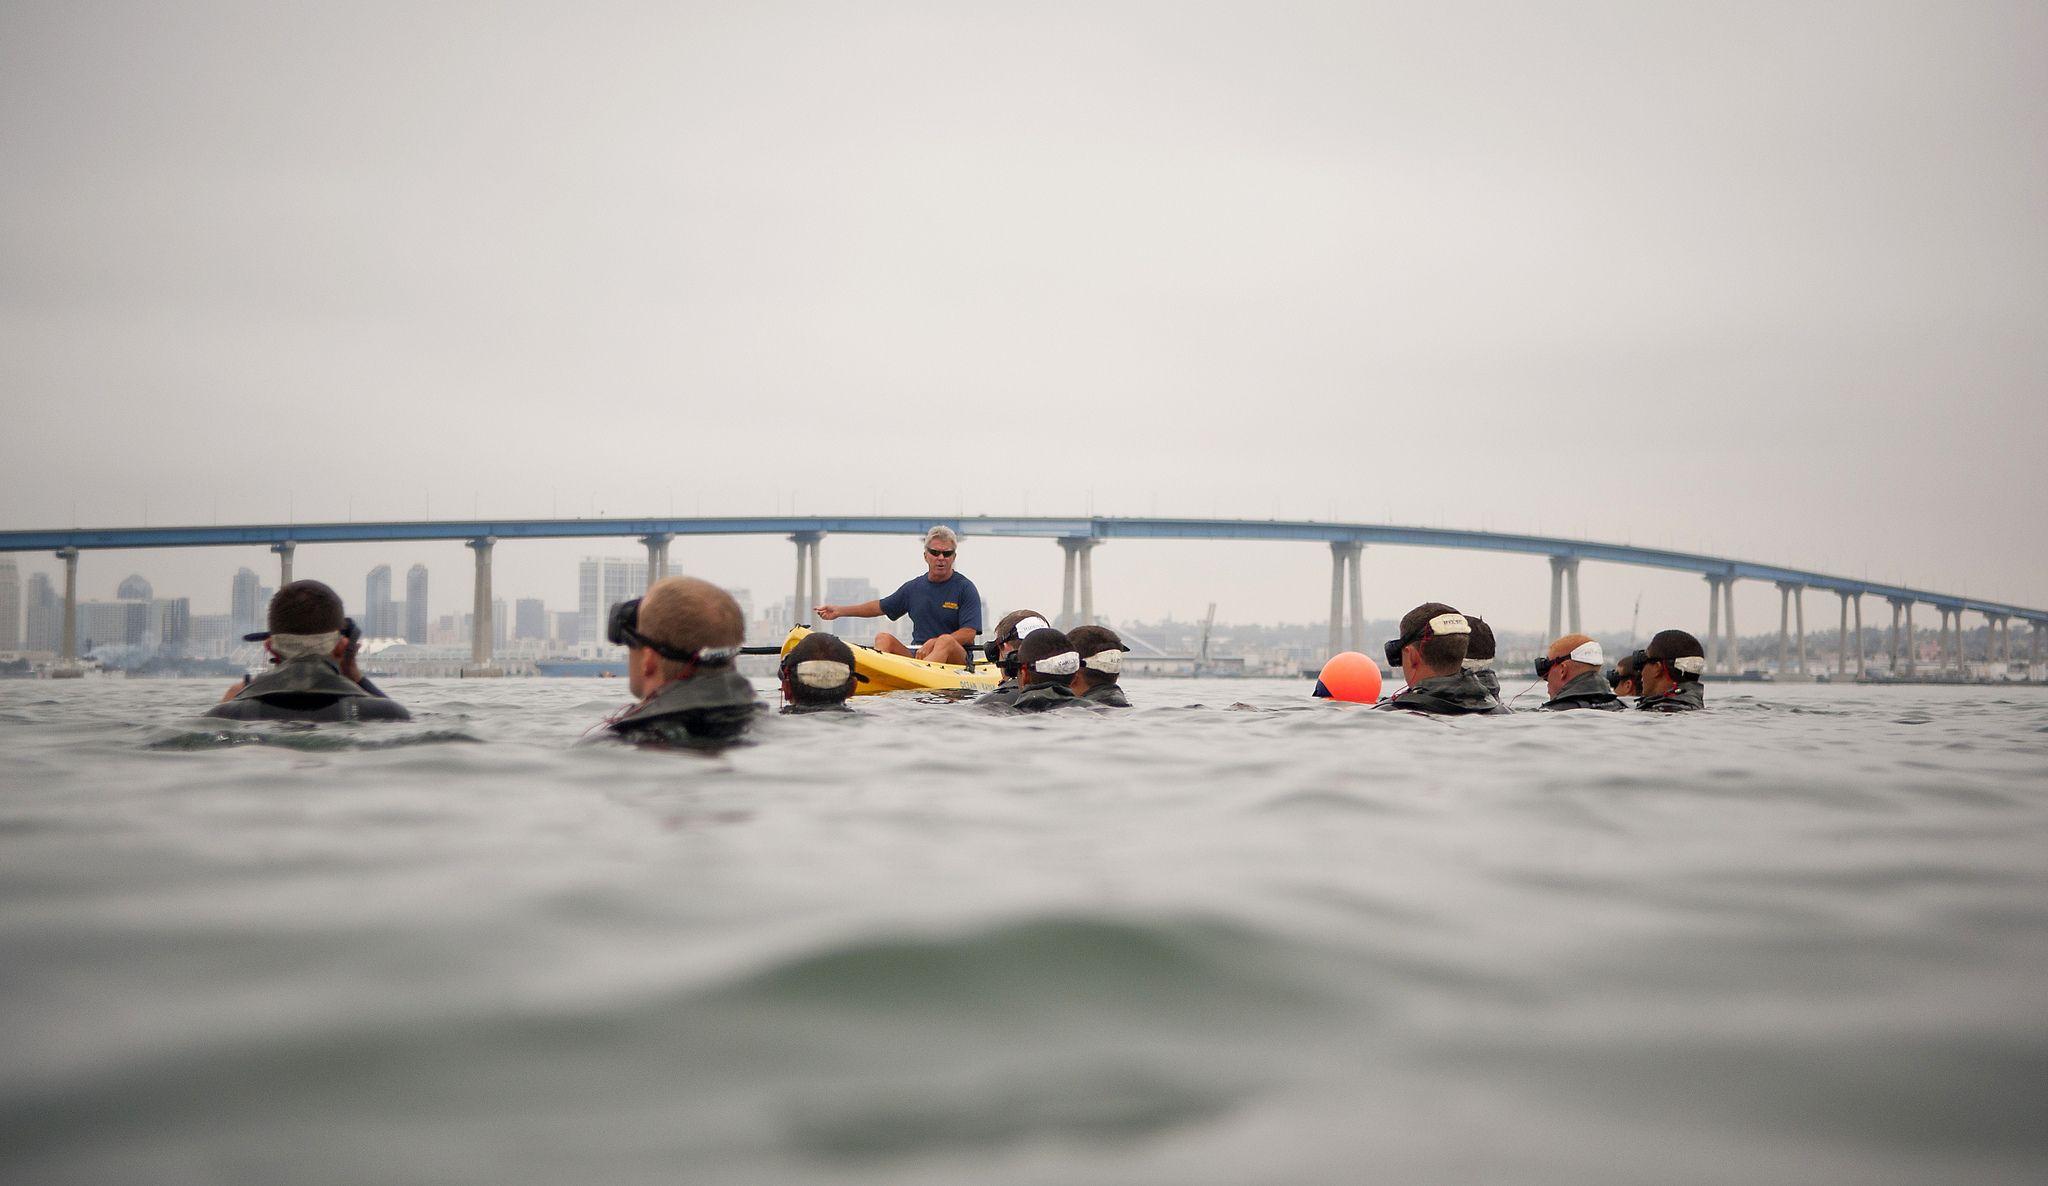 Buds student participates in interval swim training in san